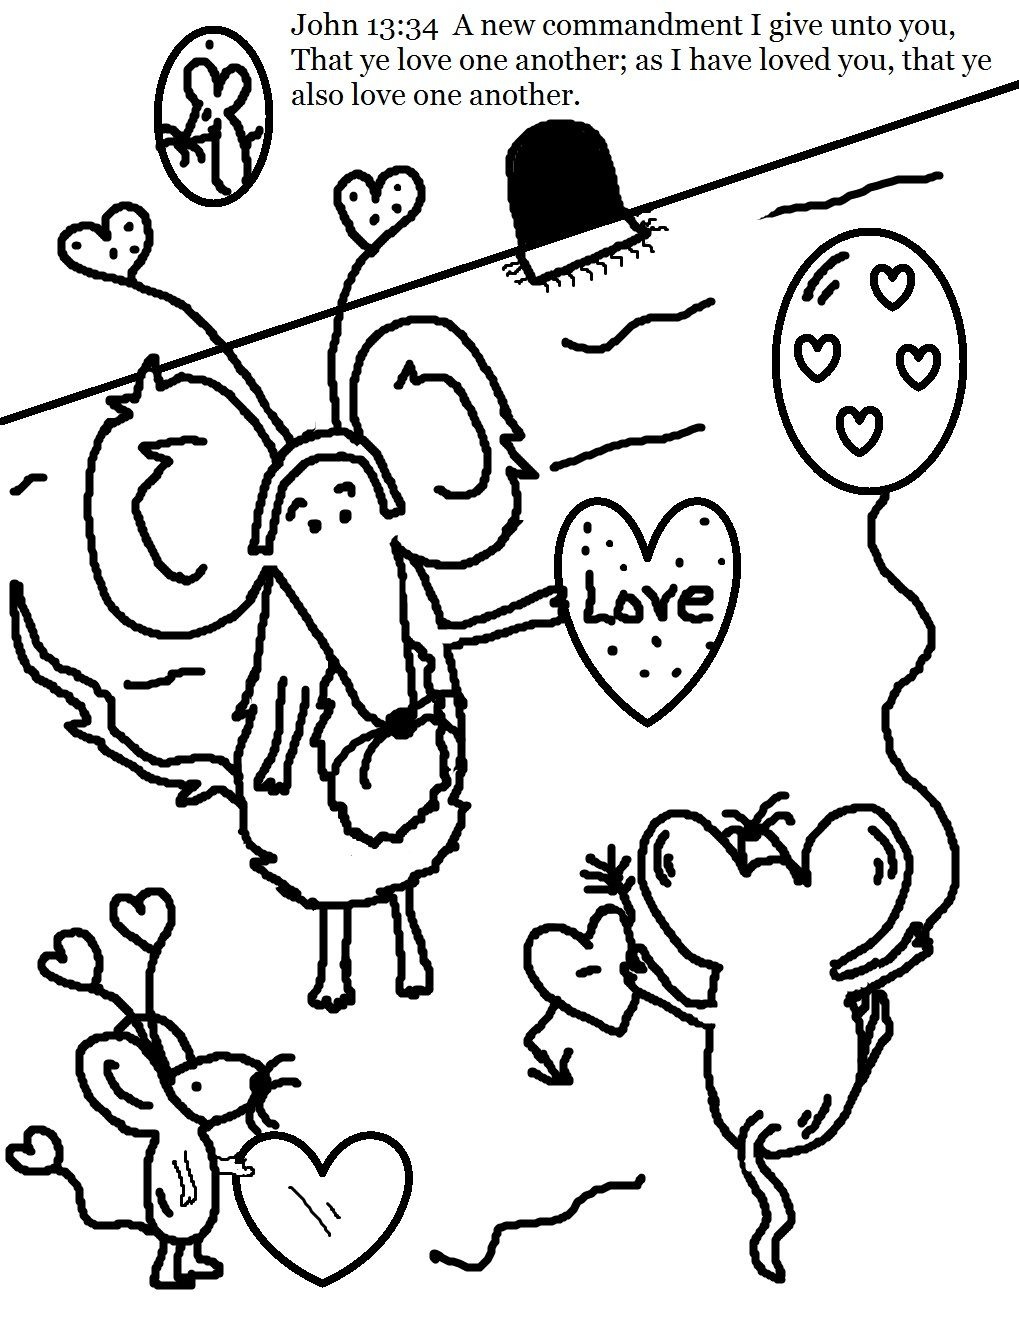 Valentine Mice John 1334 coloring page. Valentine